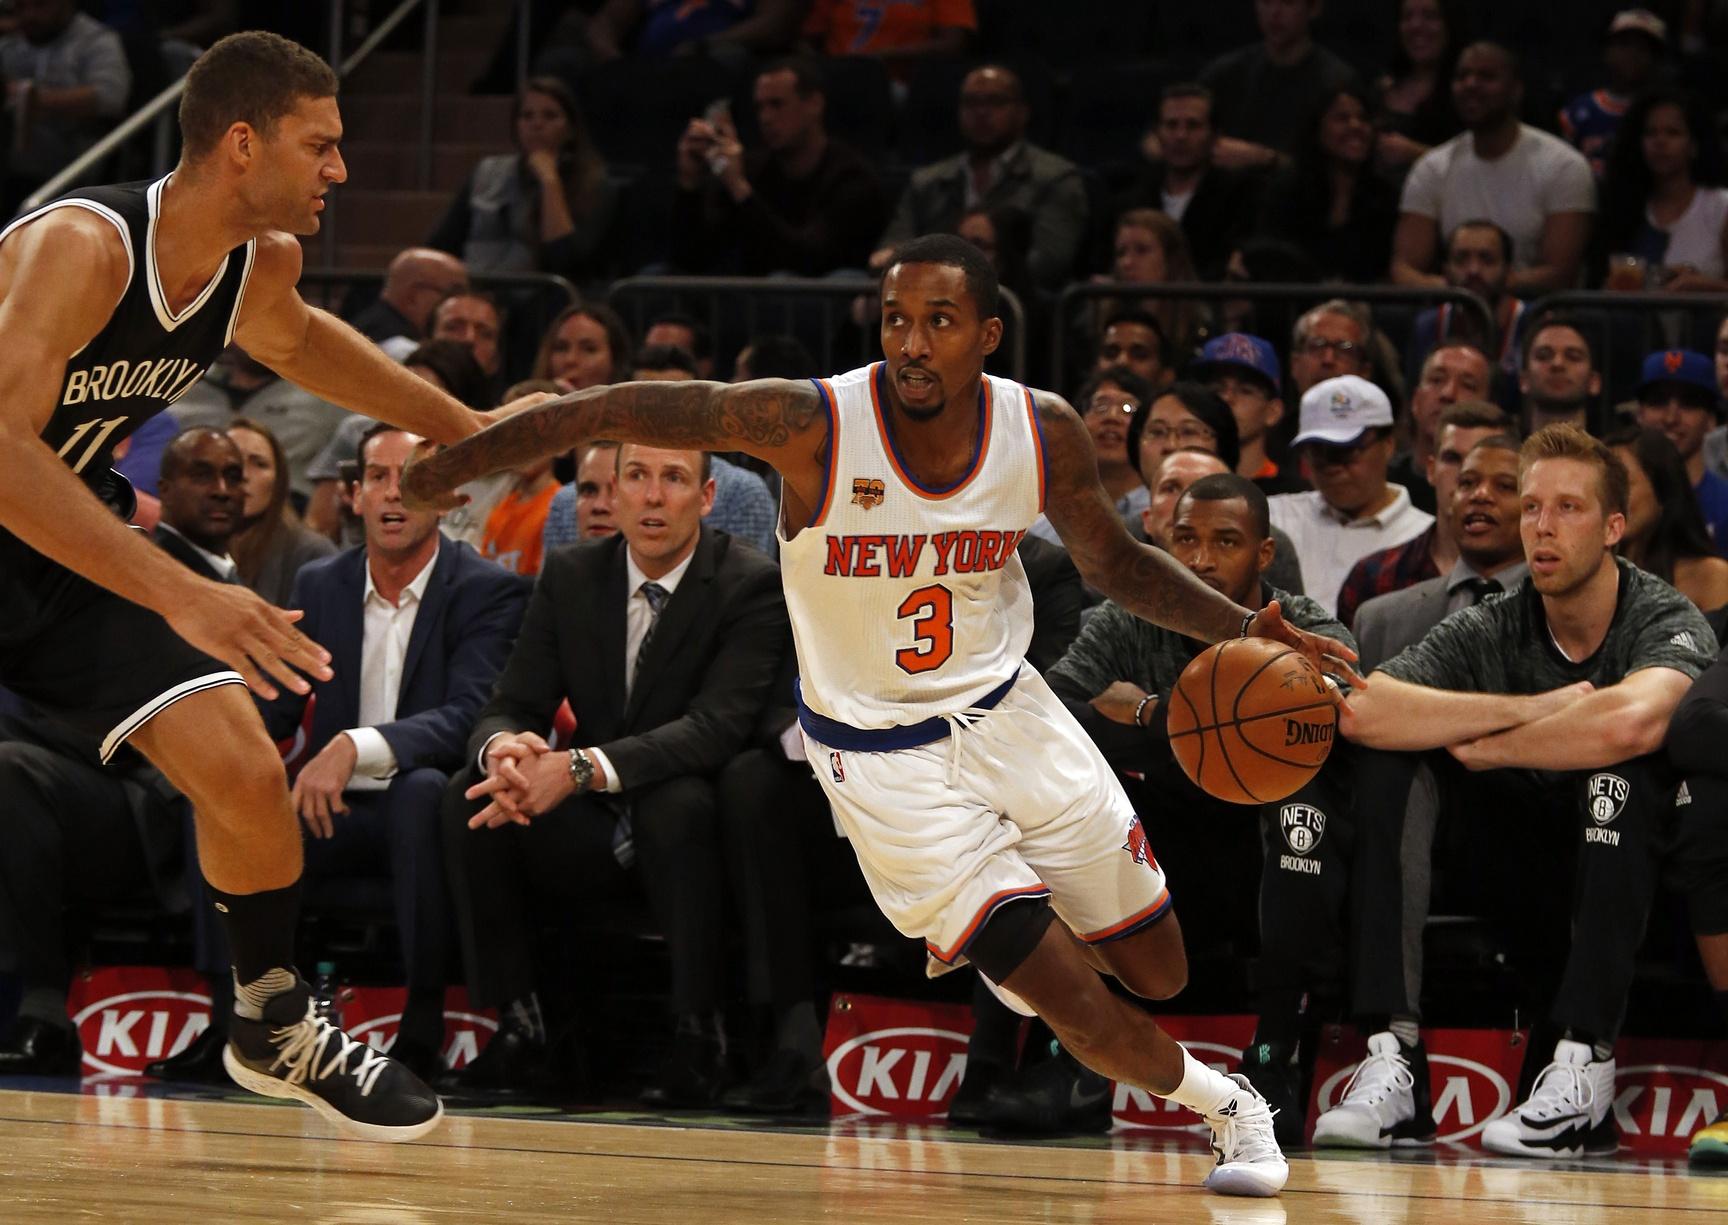 New York Knicks 116, Brooklyn Nets 98: The Brandon Jennings Show